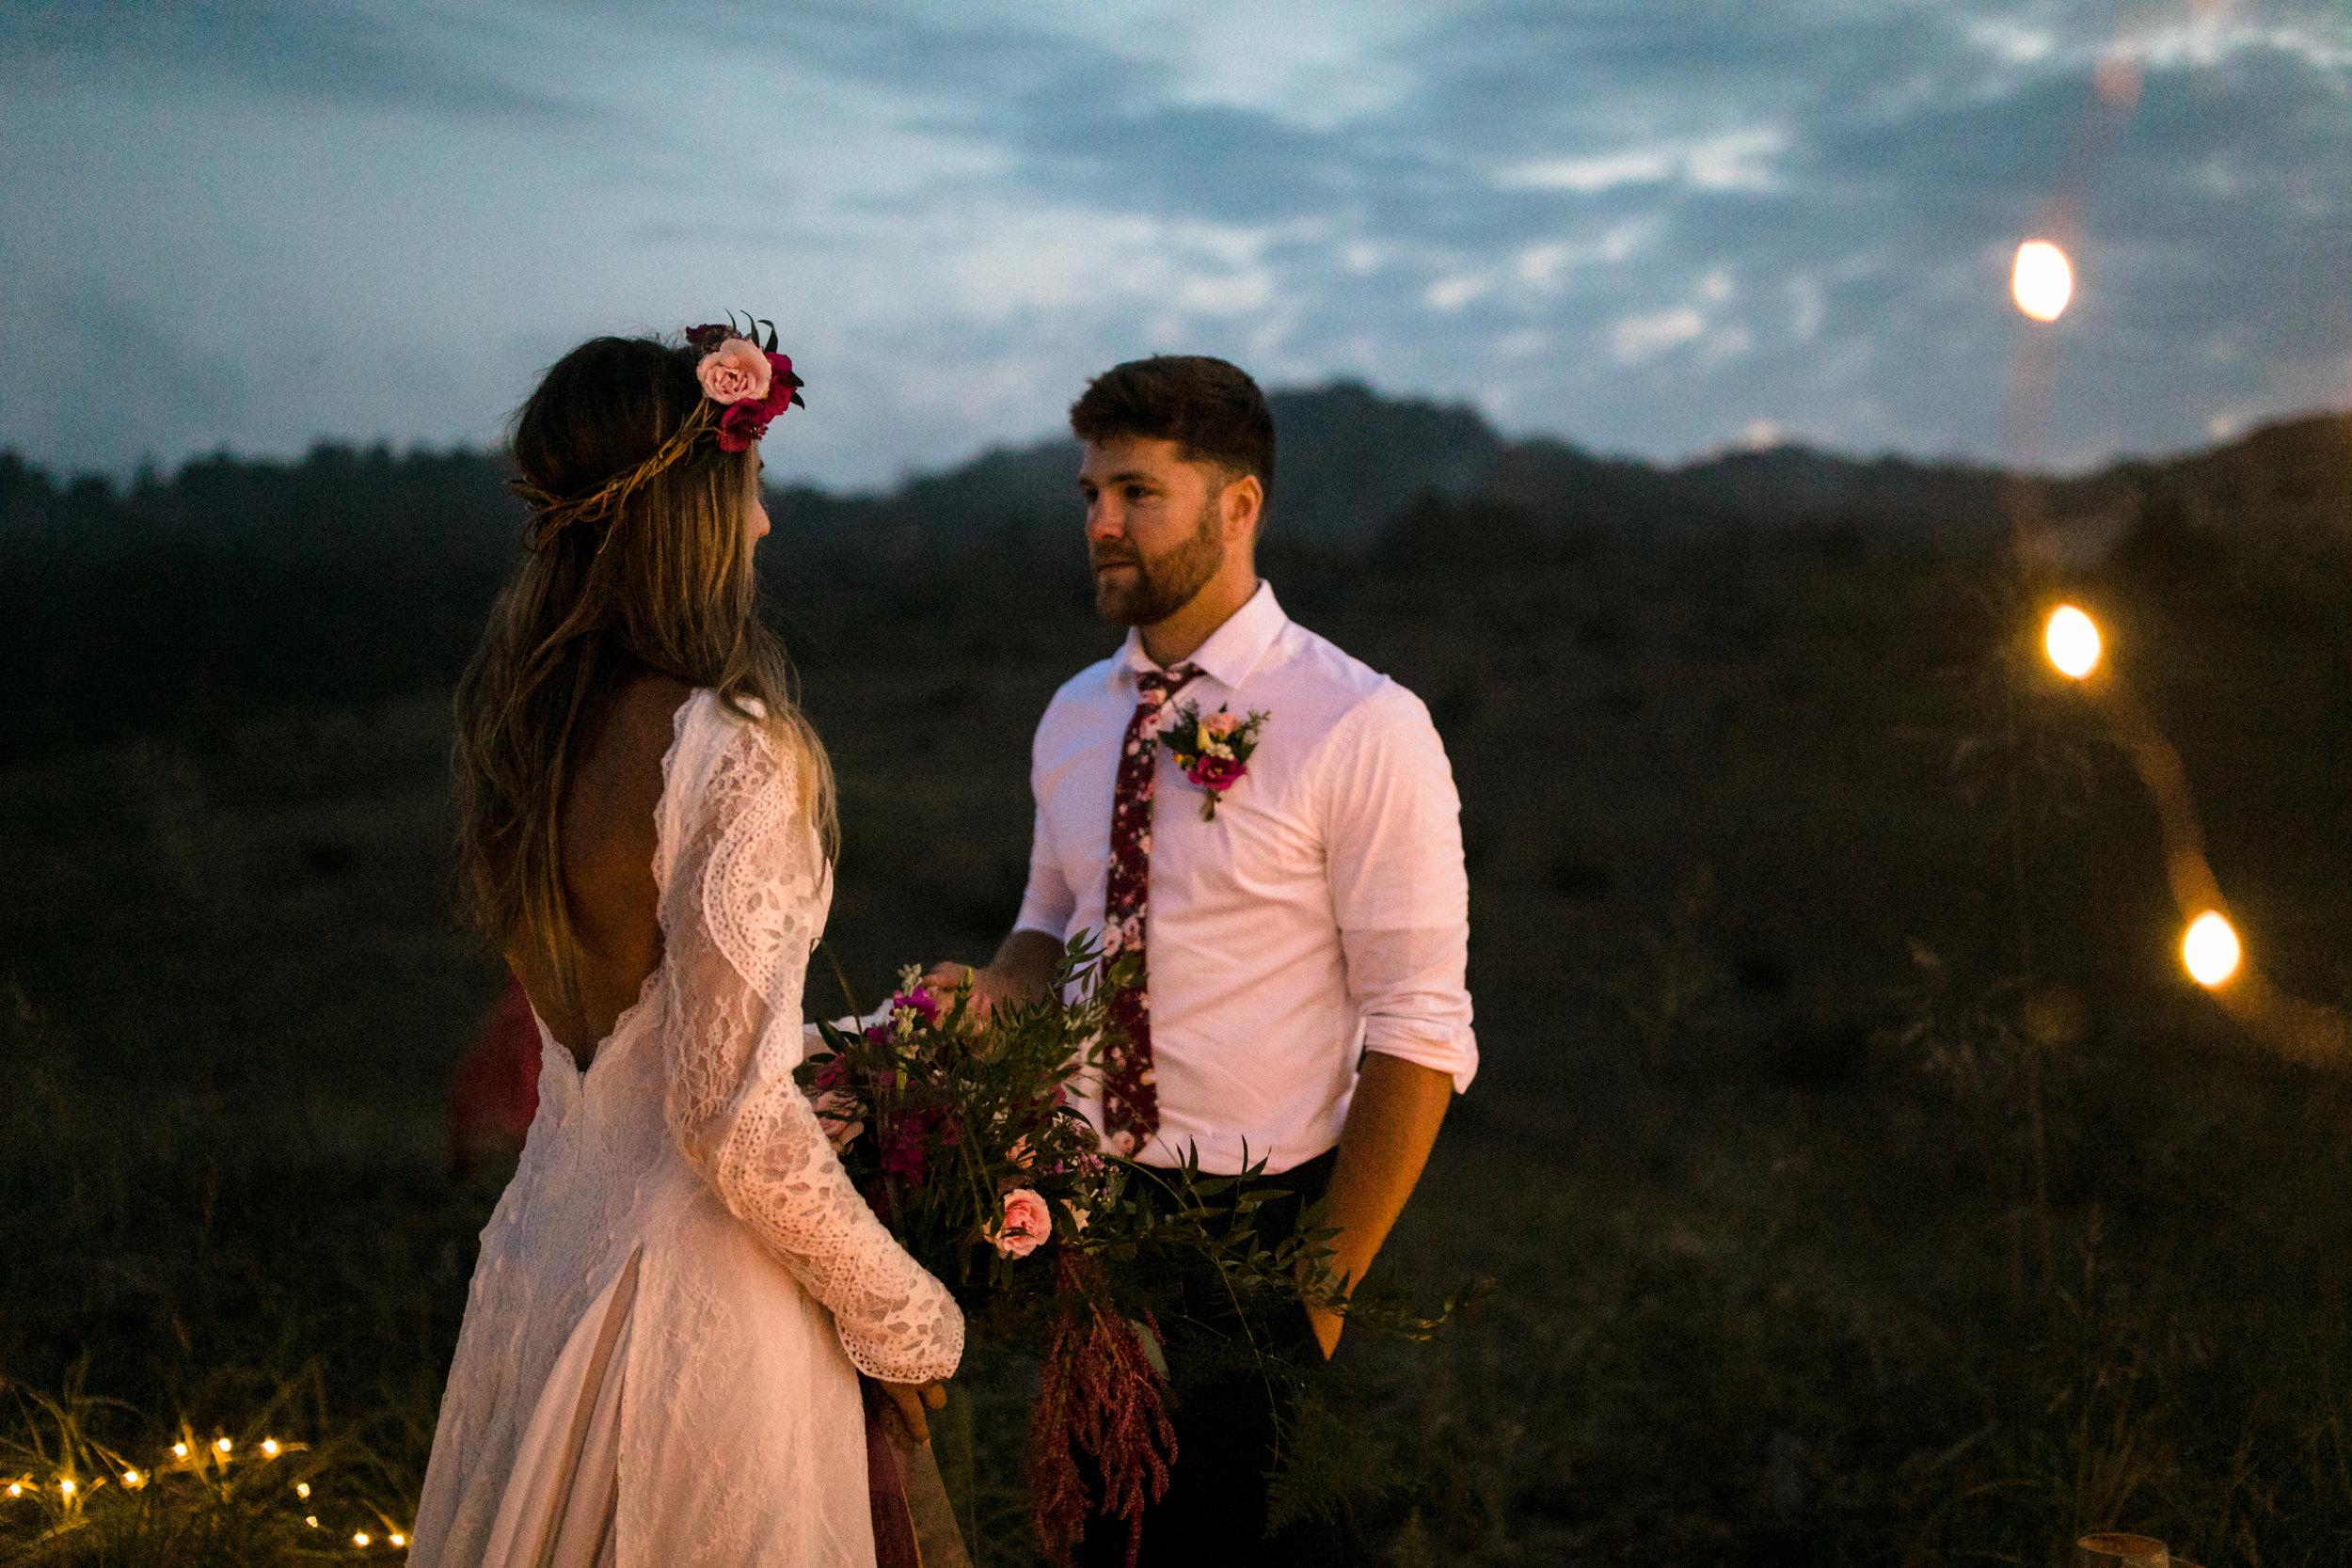 michigan-emotive-photographer-moonlight-elopement-mariha-hunter-268.jpg